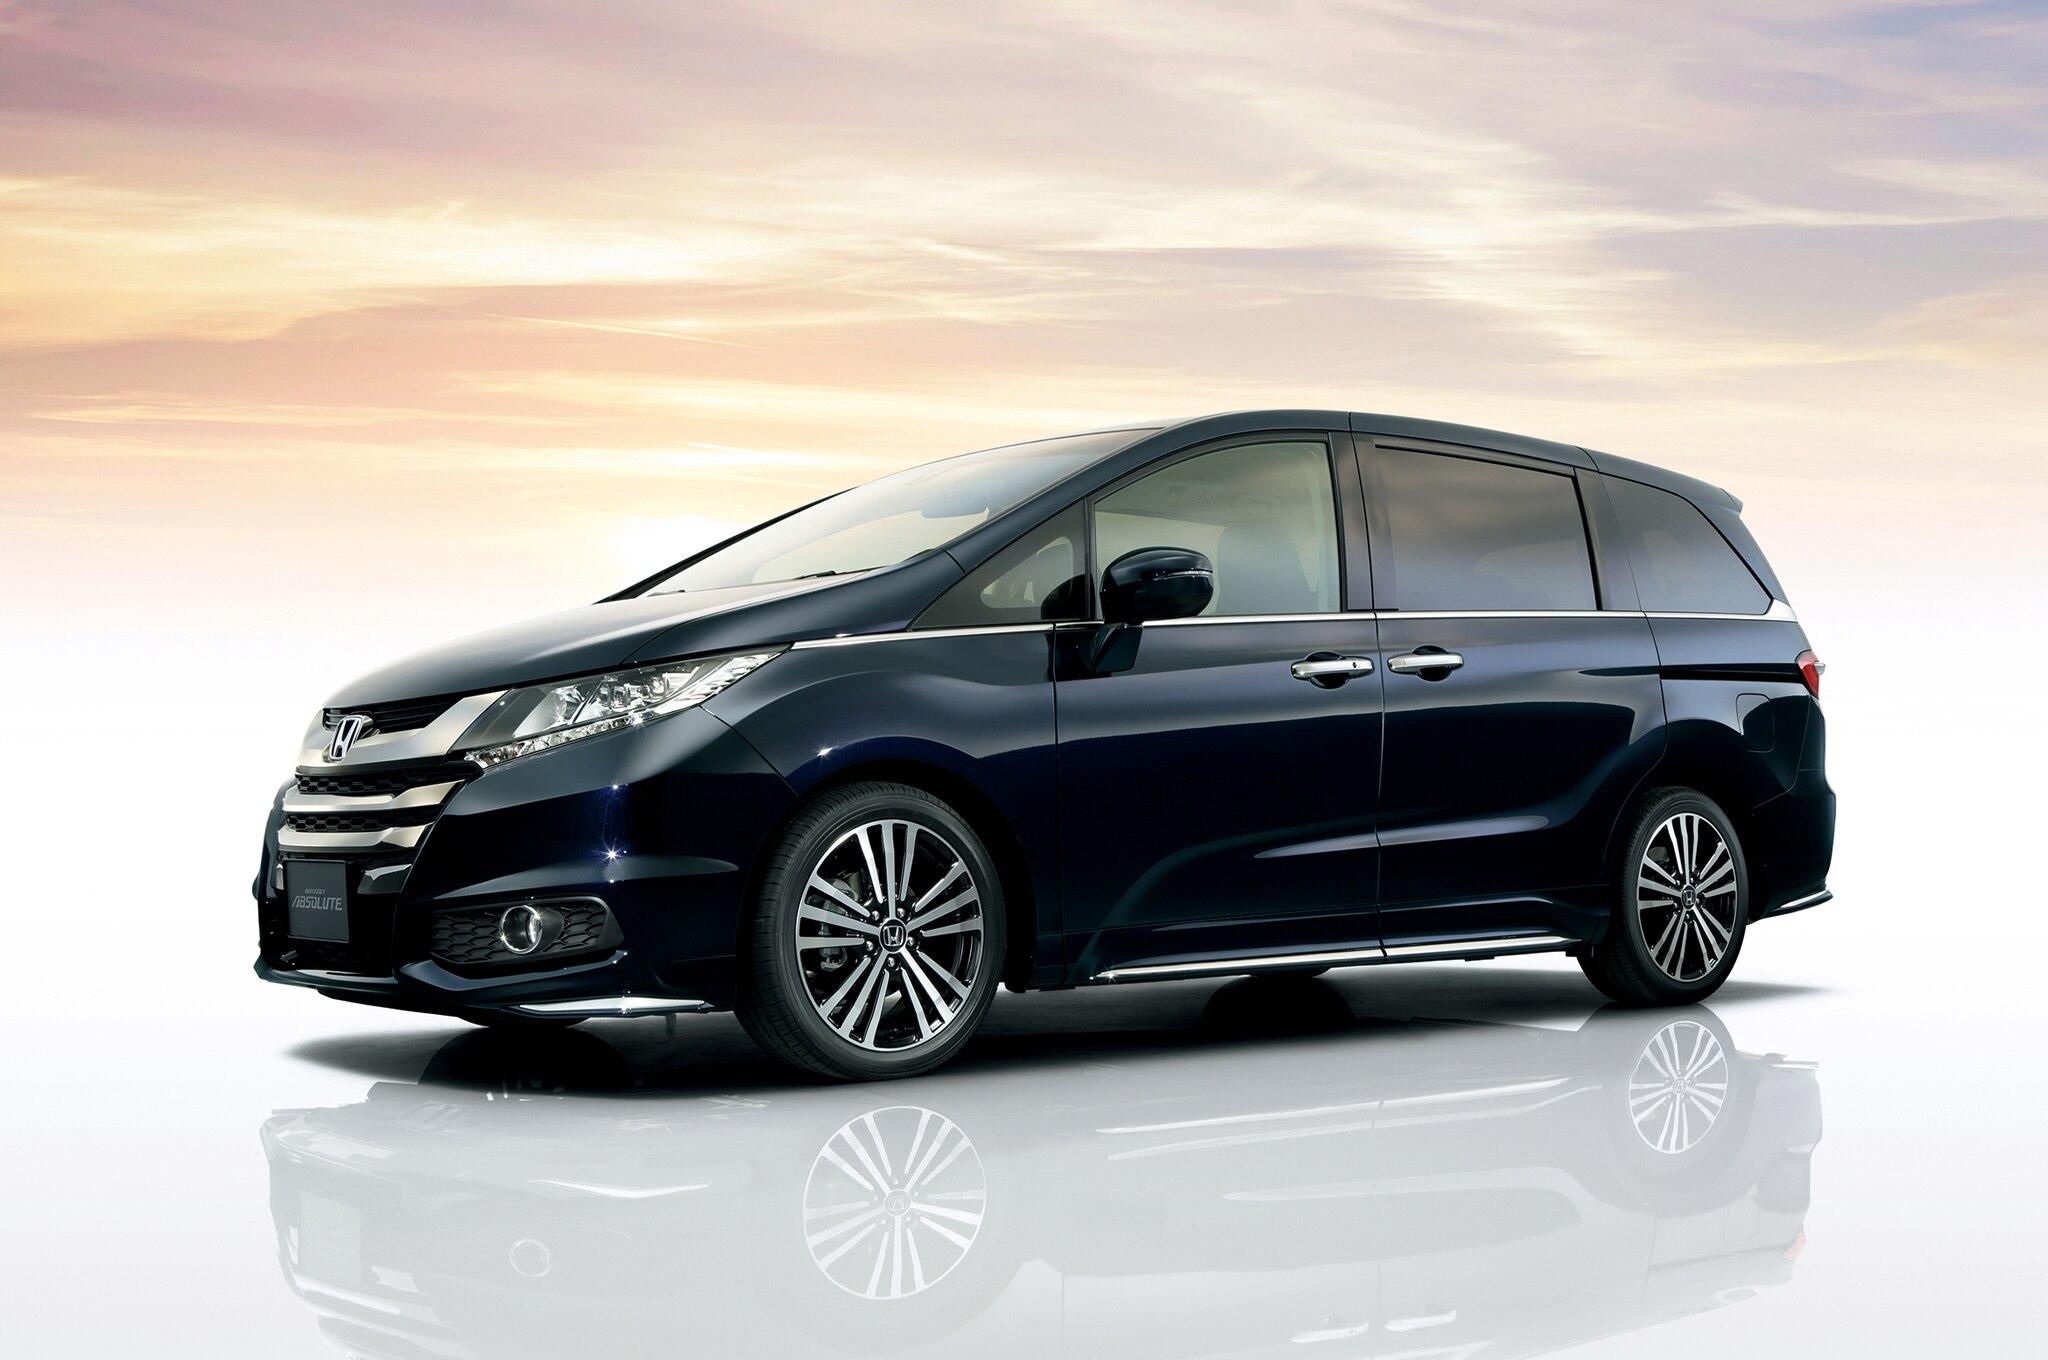 2014 Honda Odyssey Absolute Jdm Profile1